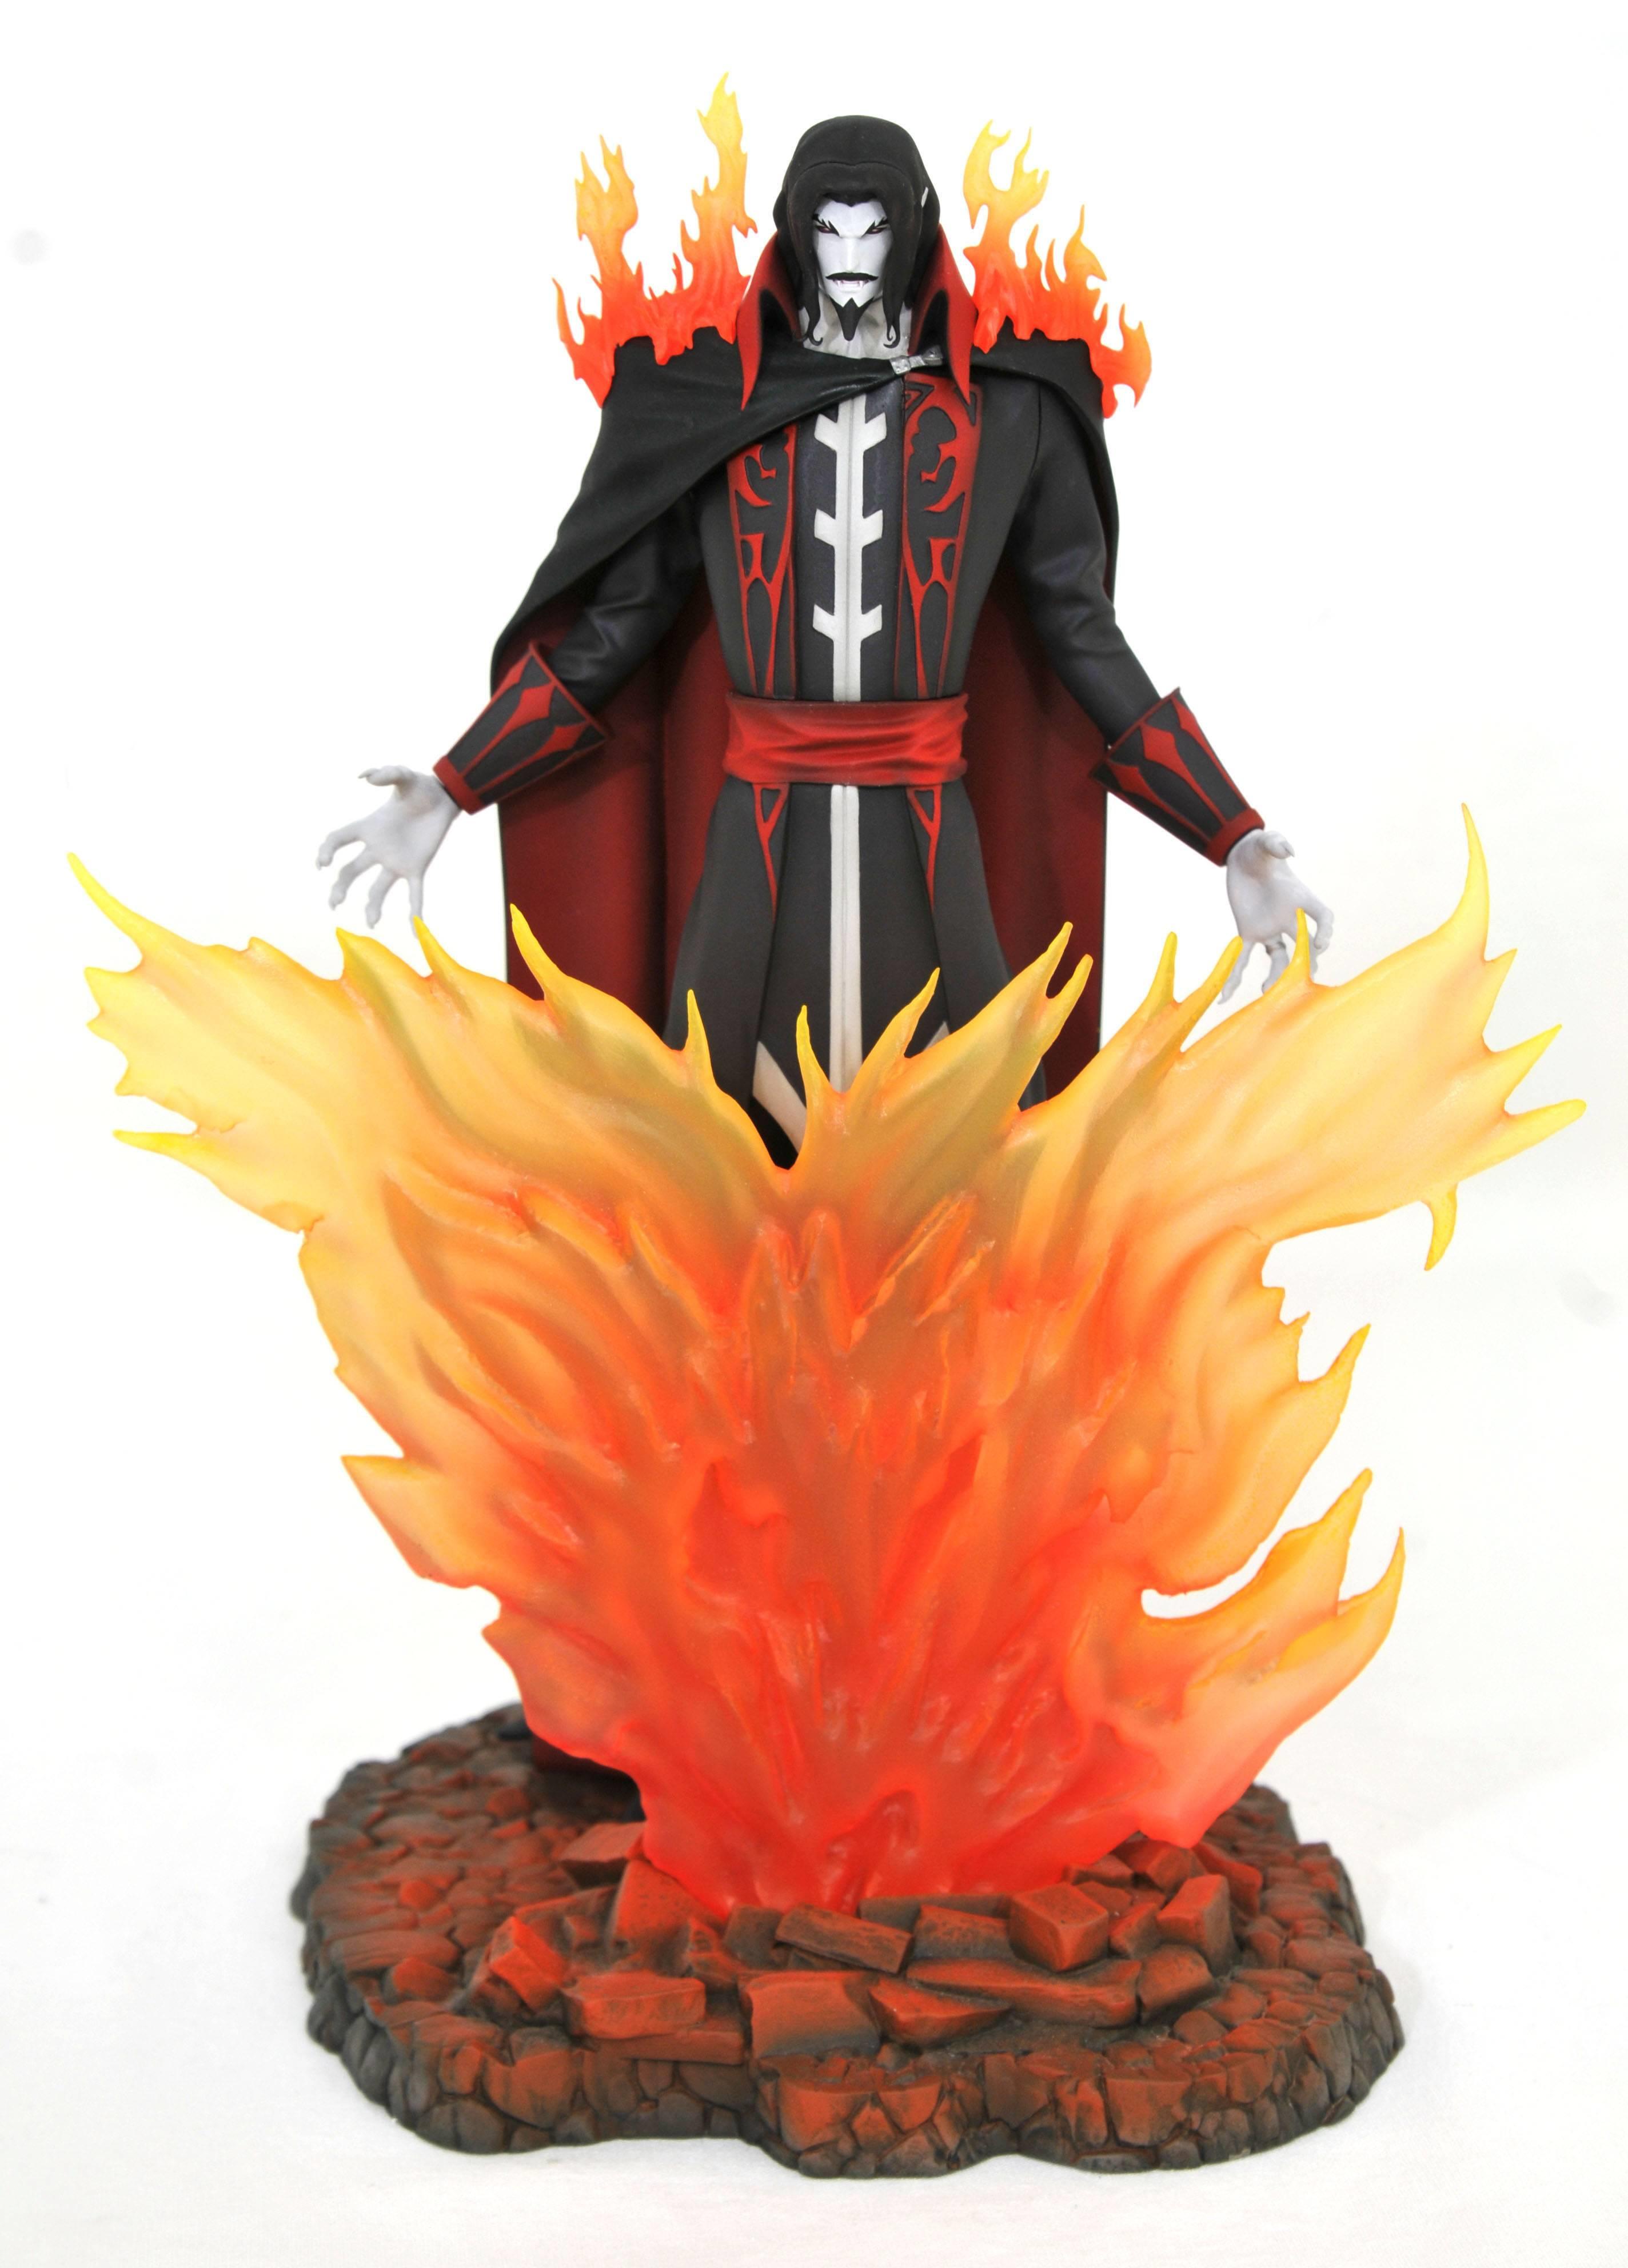 Castlevania Gallery - Dracula PVC Statue